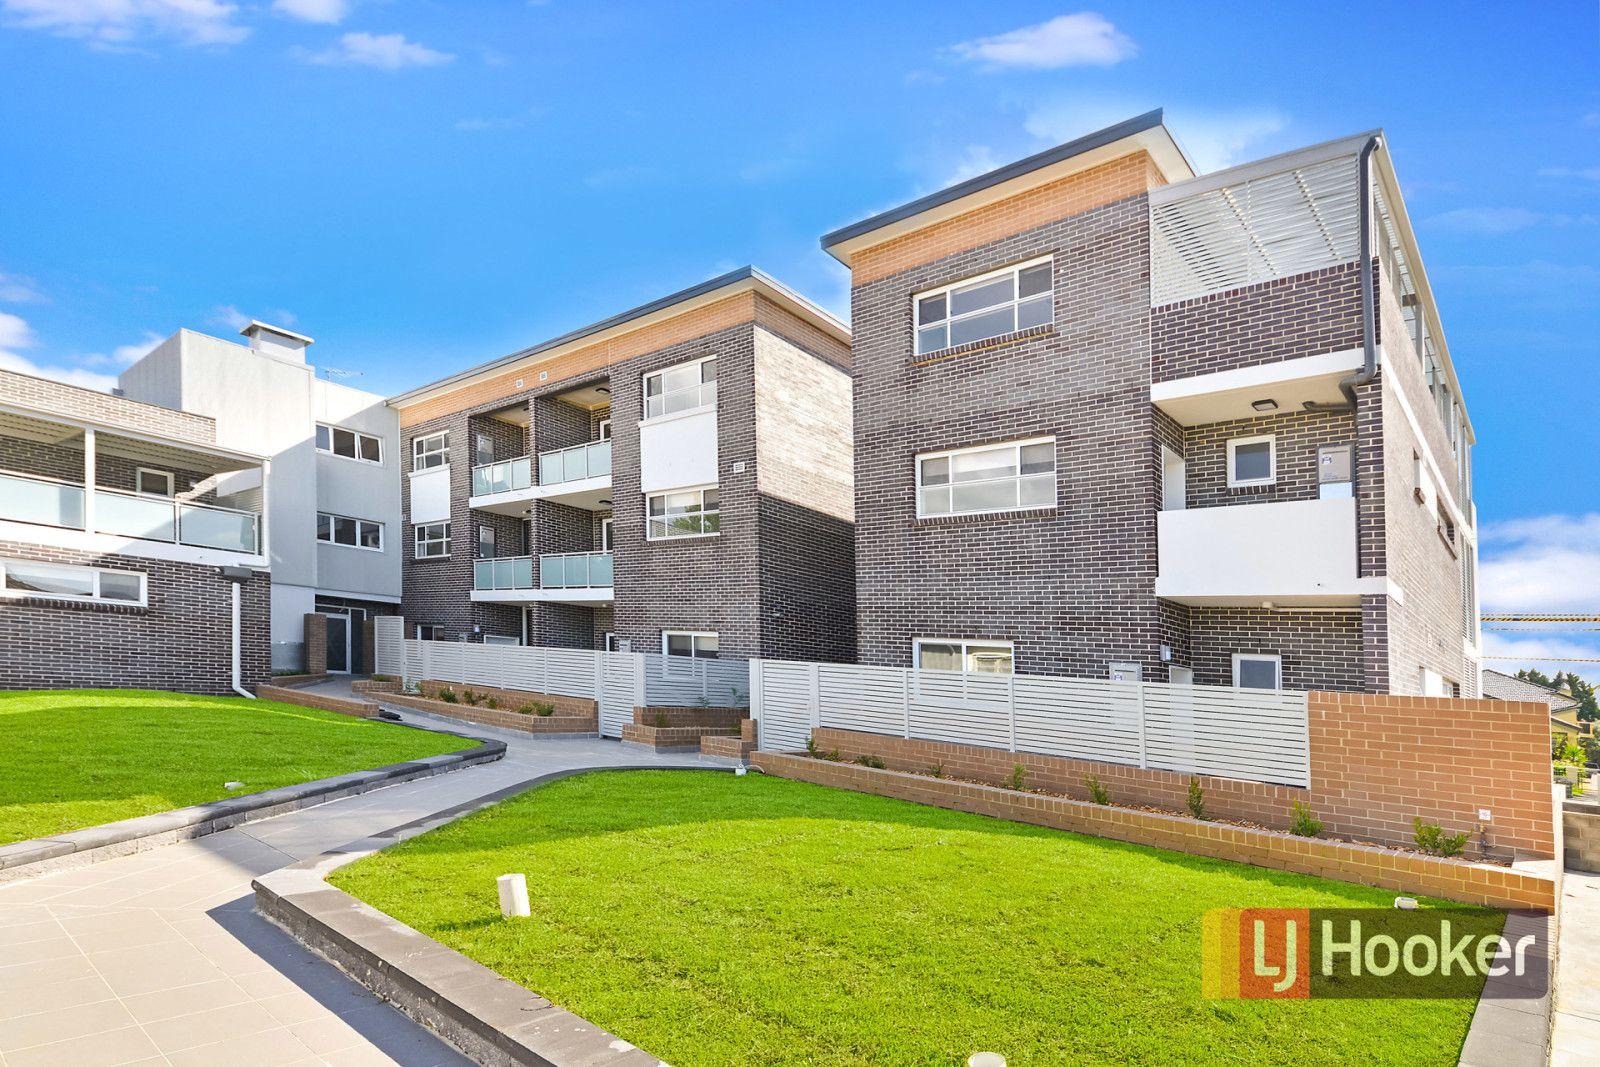 2/48 Mountford Ave, Guildford NSW 2161, Image 0